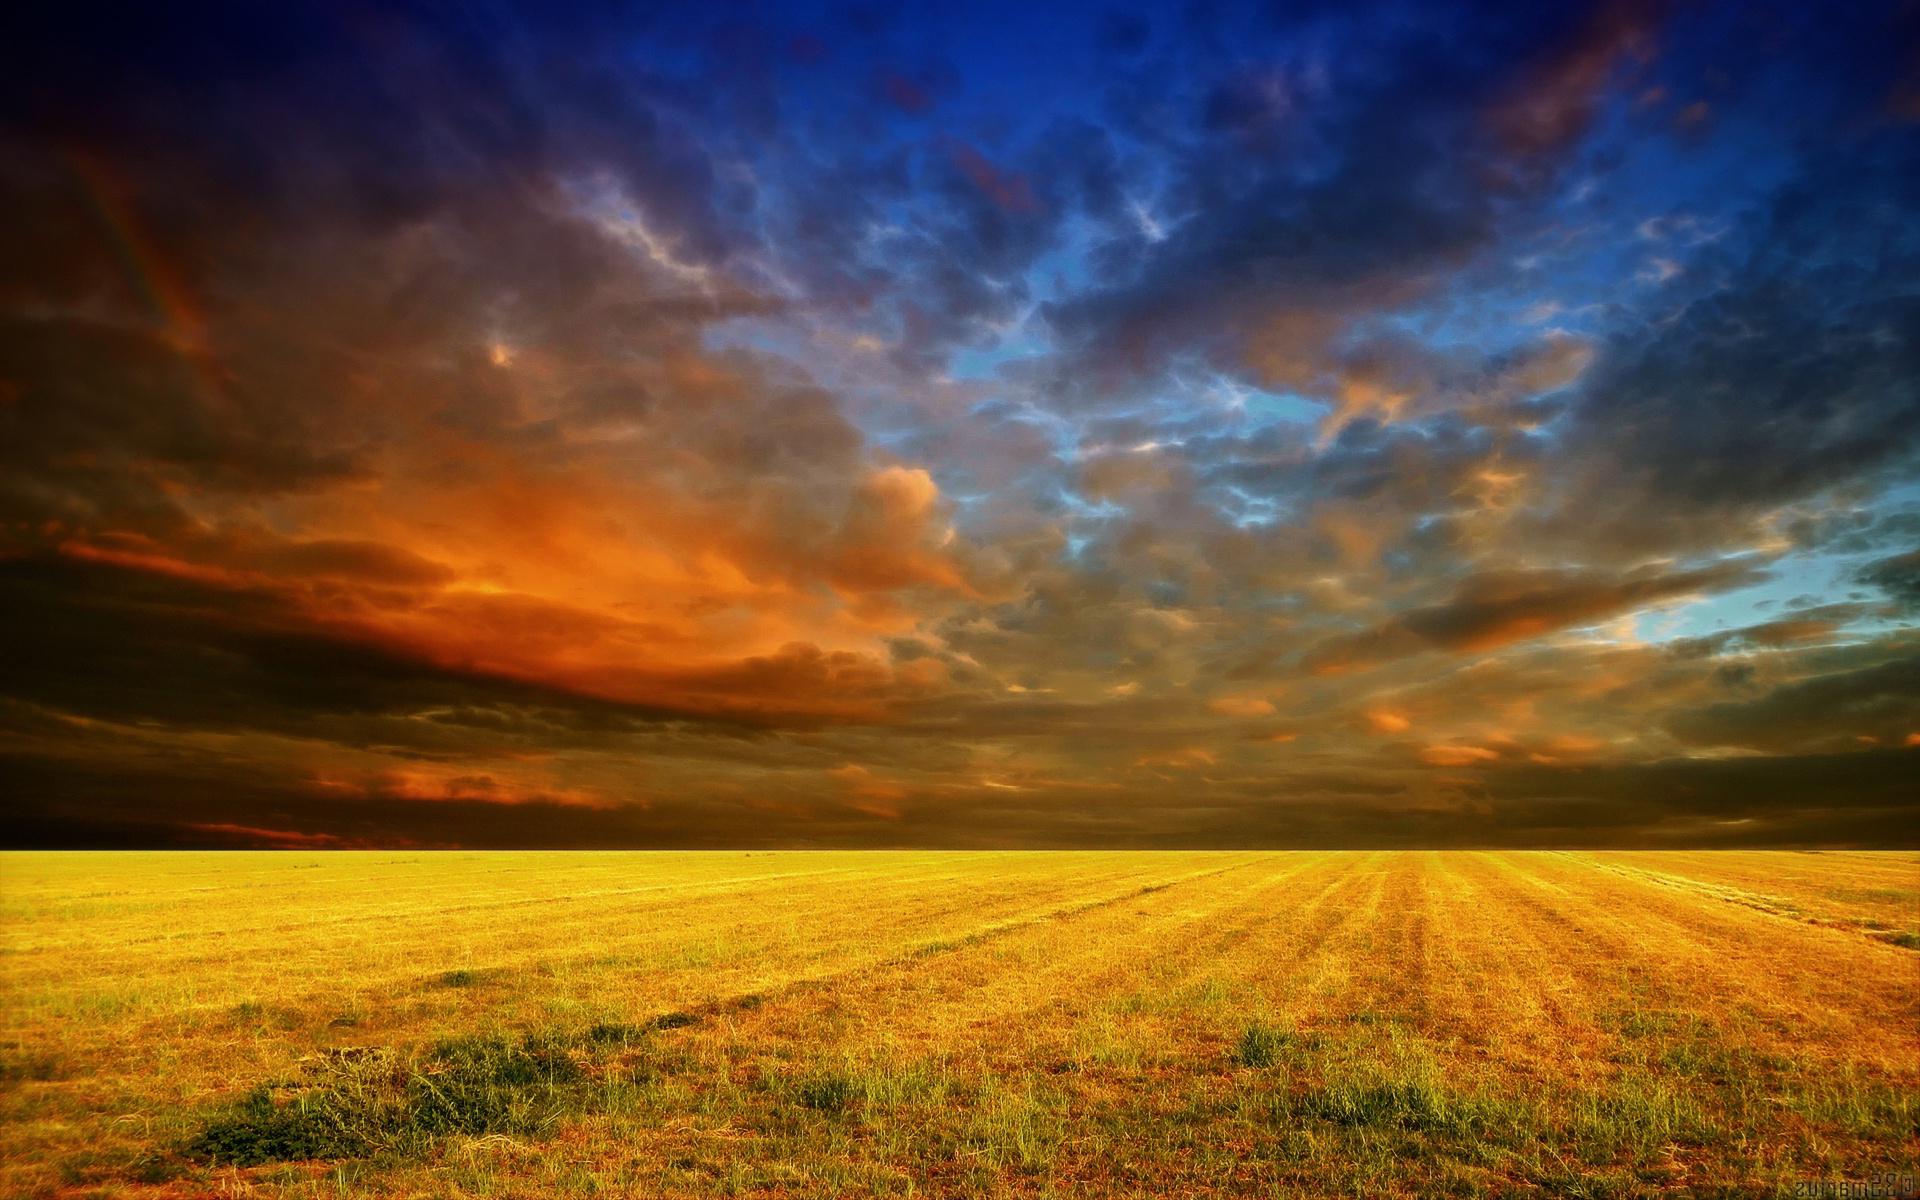 Cloudy sunset cornfield